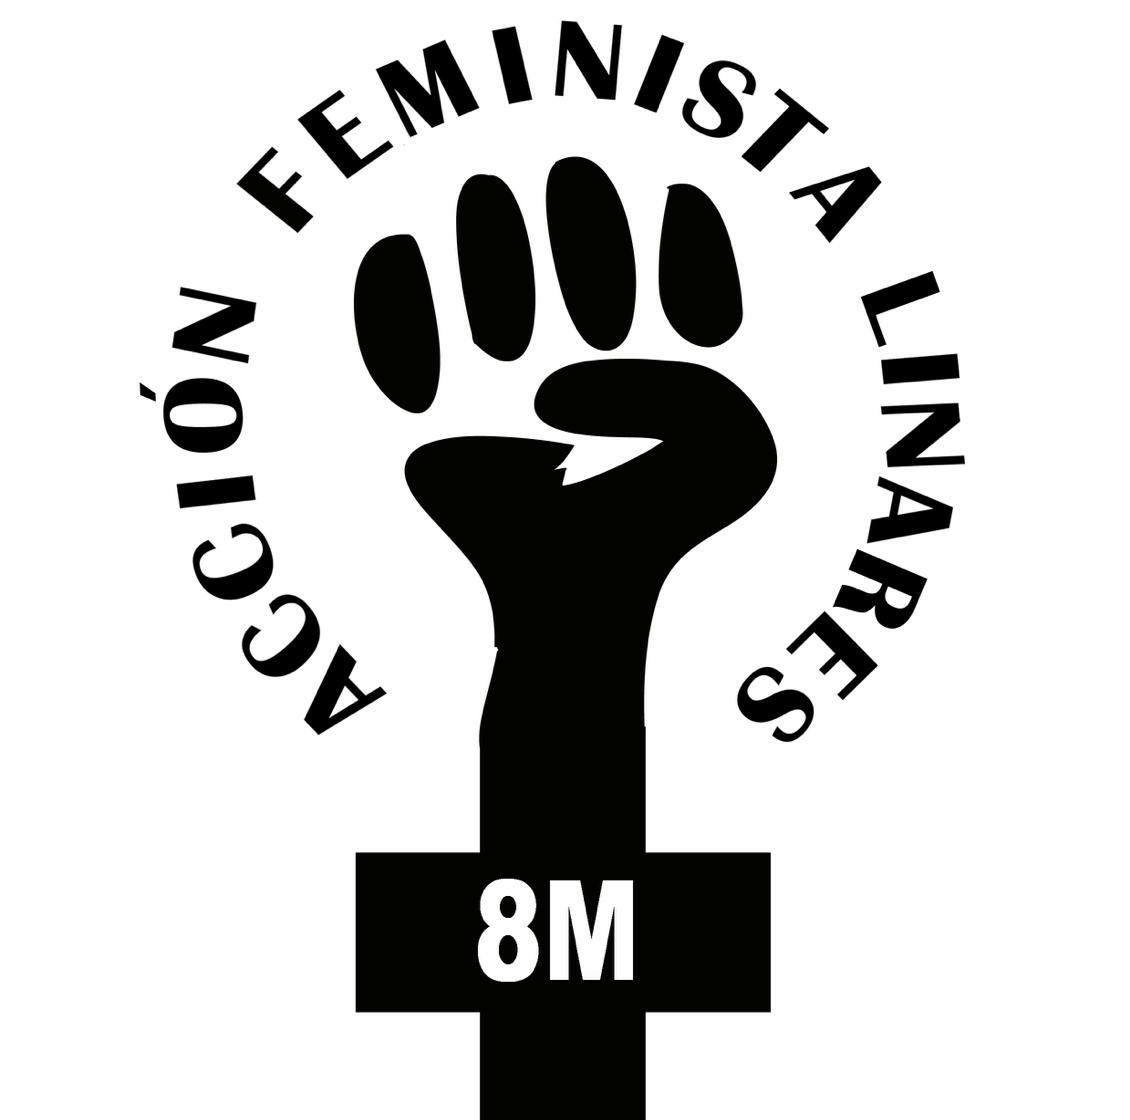 ACCIÓN FEMINISTA LINARES